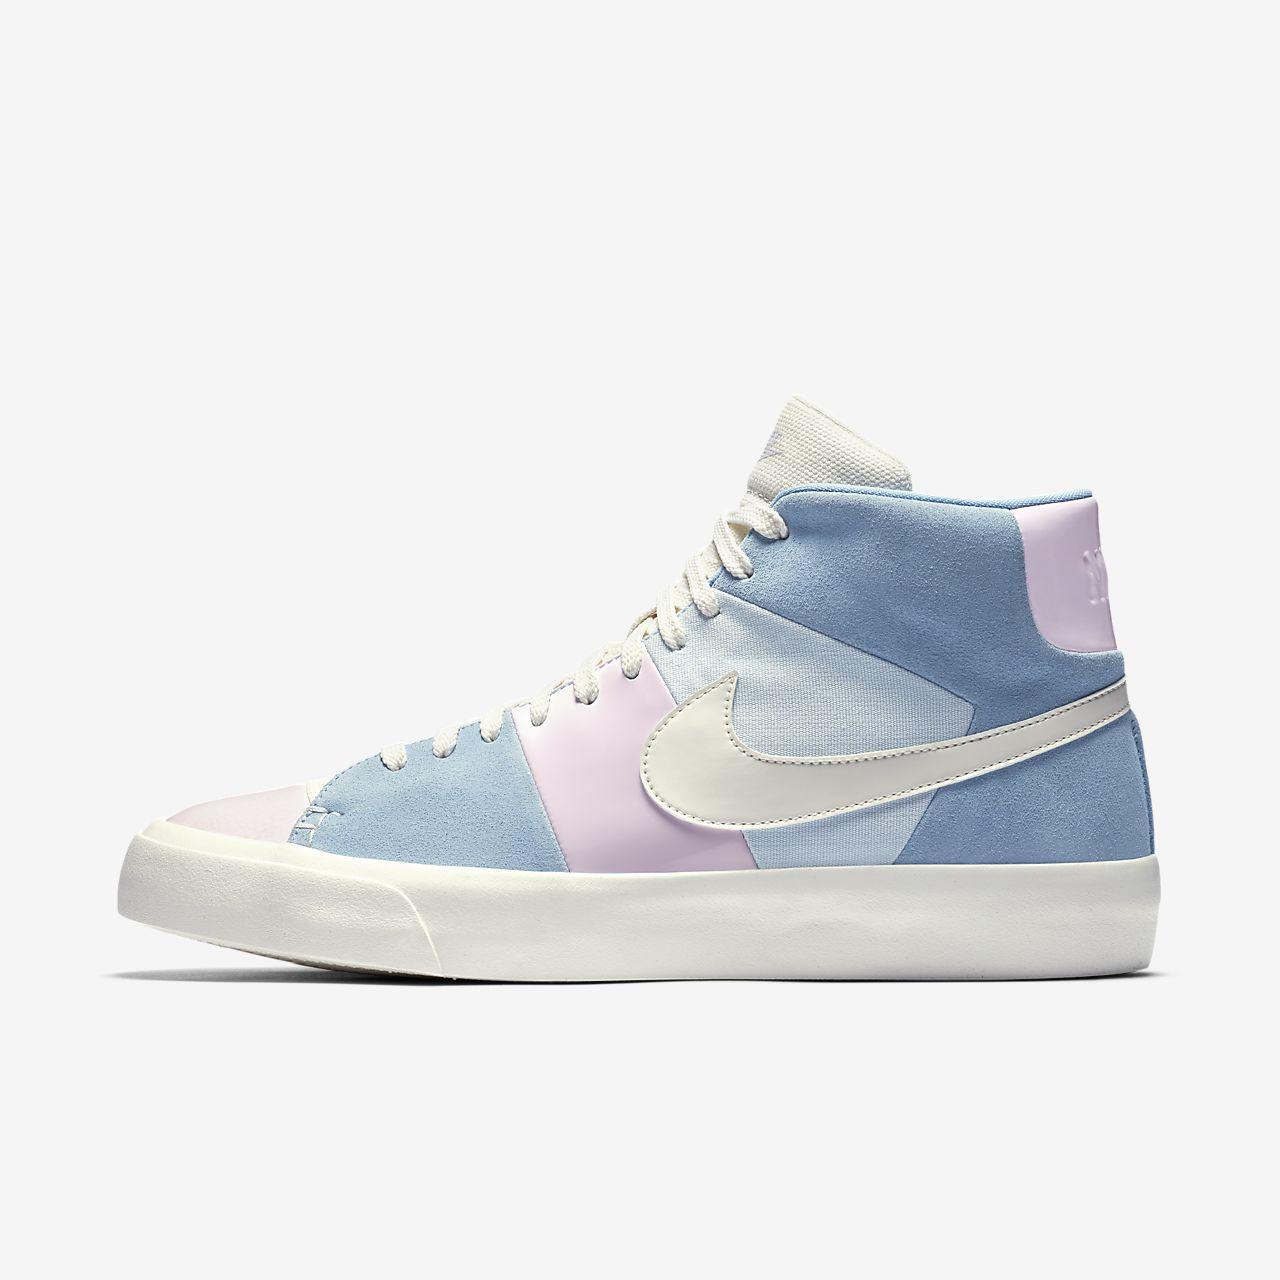 Calzado para hombre Nike Blazer Royal Easter QS